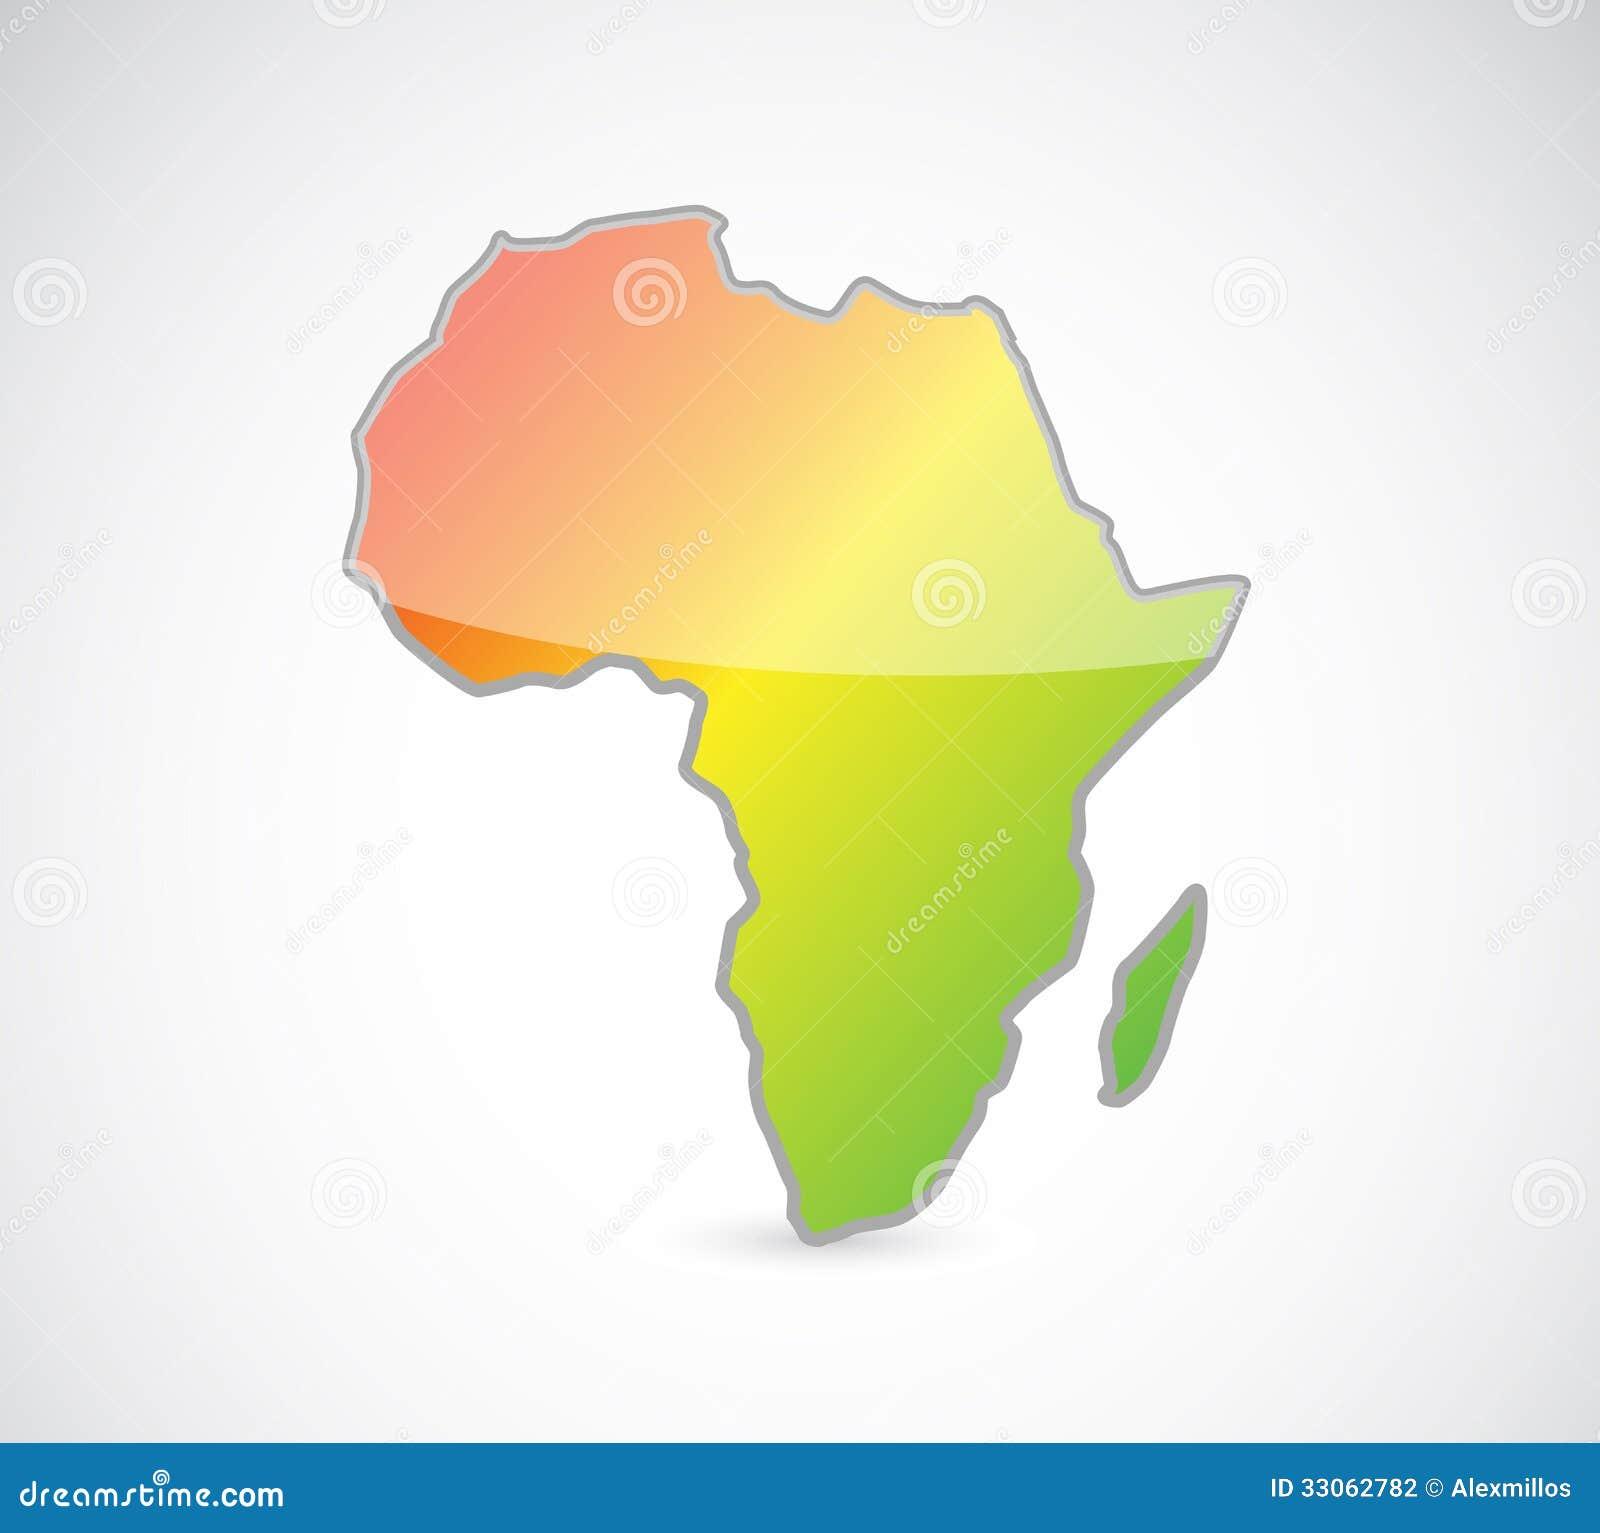 africa map designs